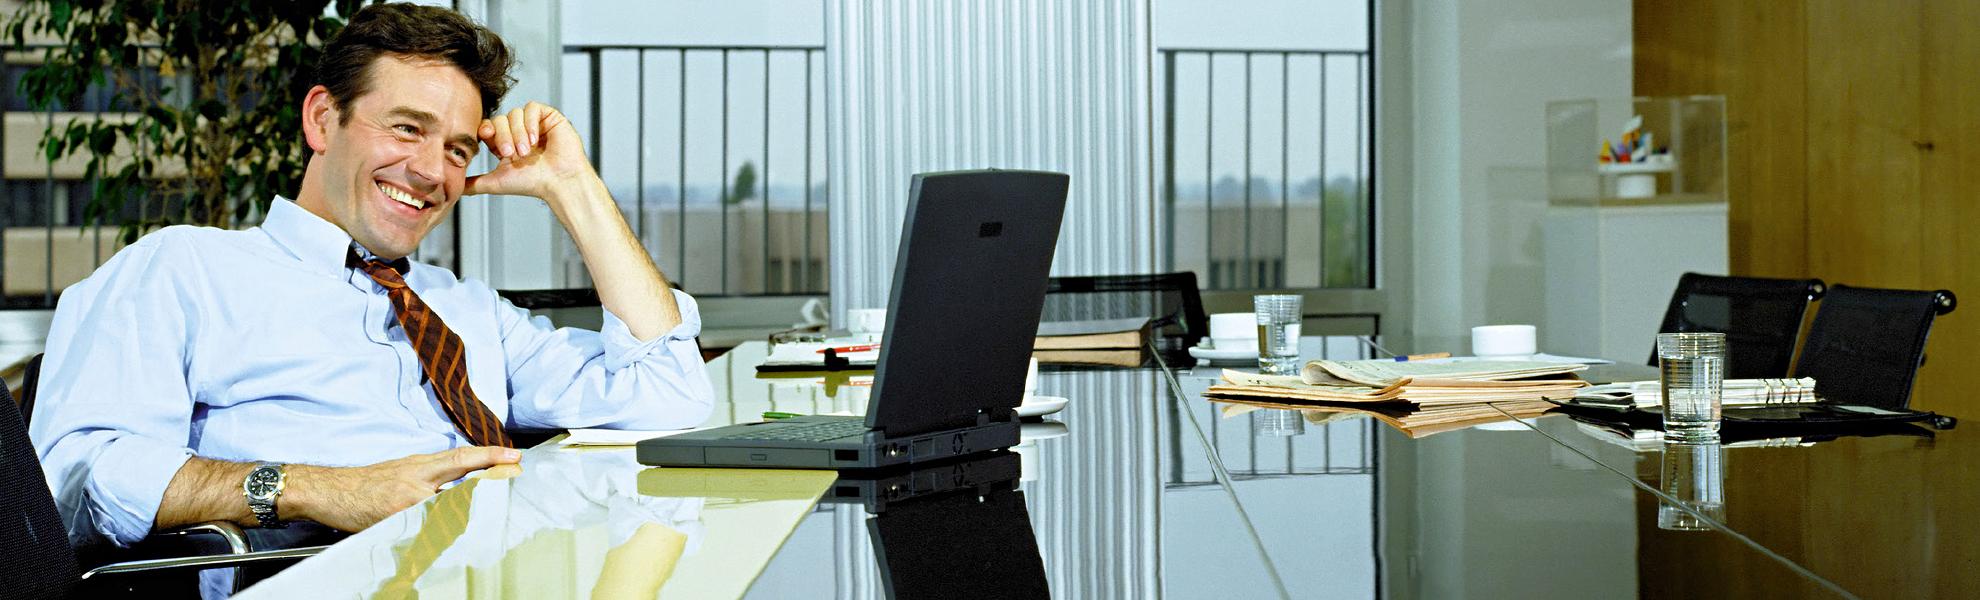 Office Top